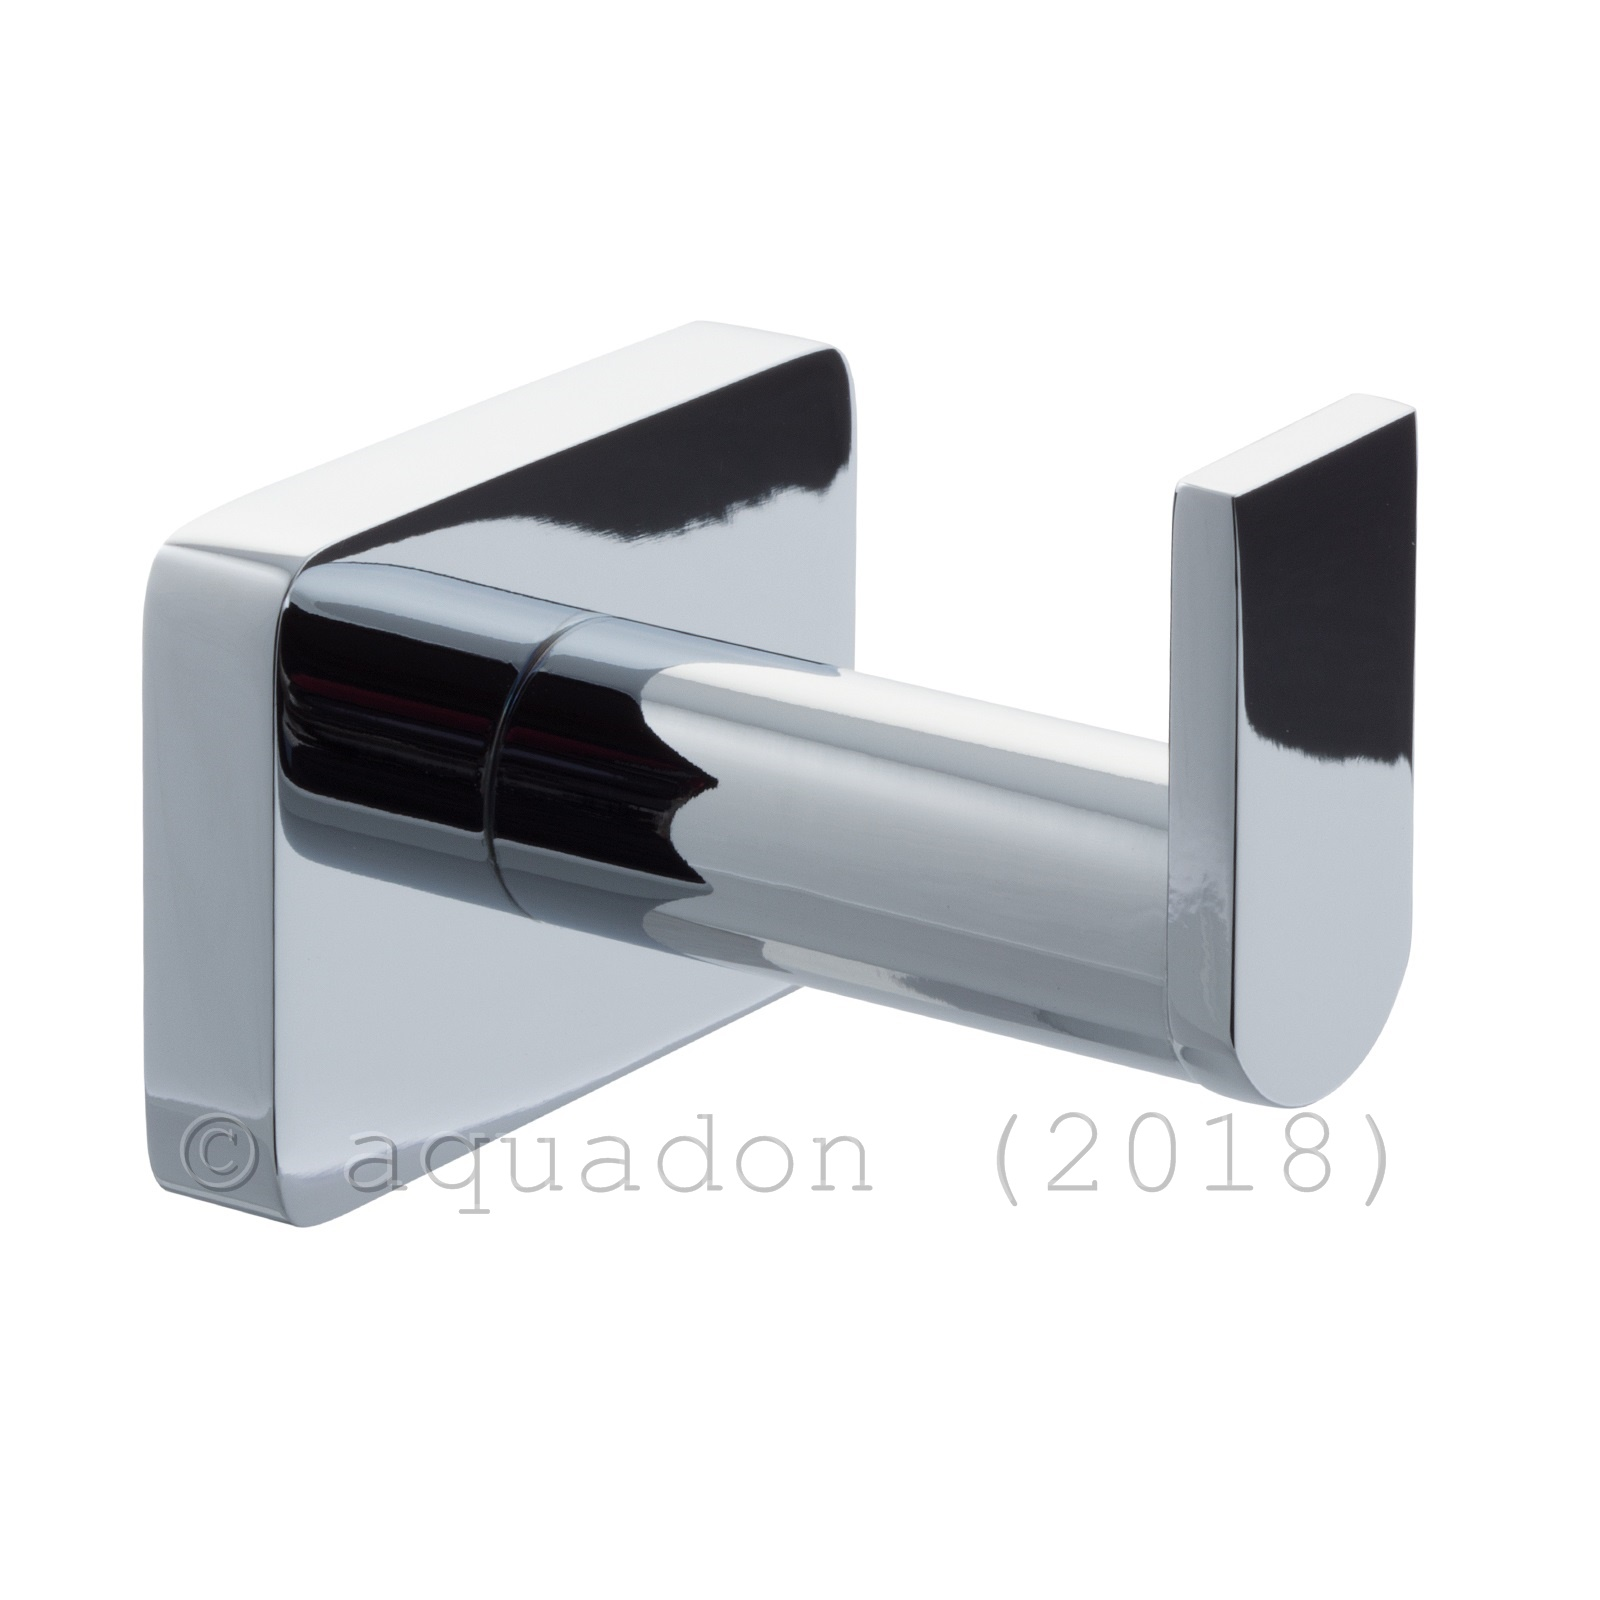 Poppy Modern Bathroom Wall Accessories Set Polished Chrome   eBay